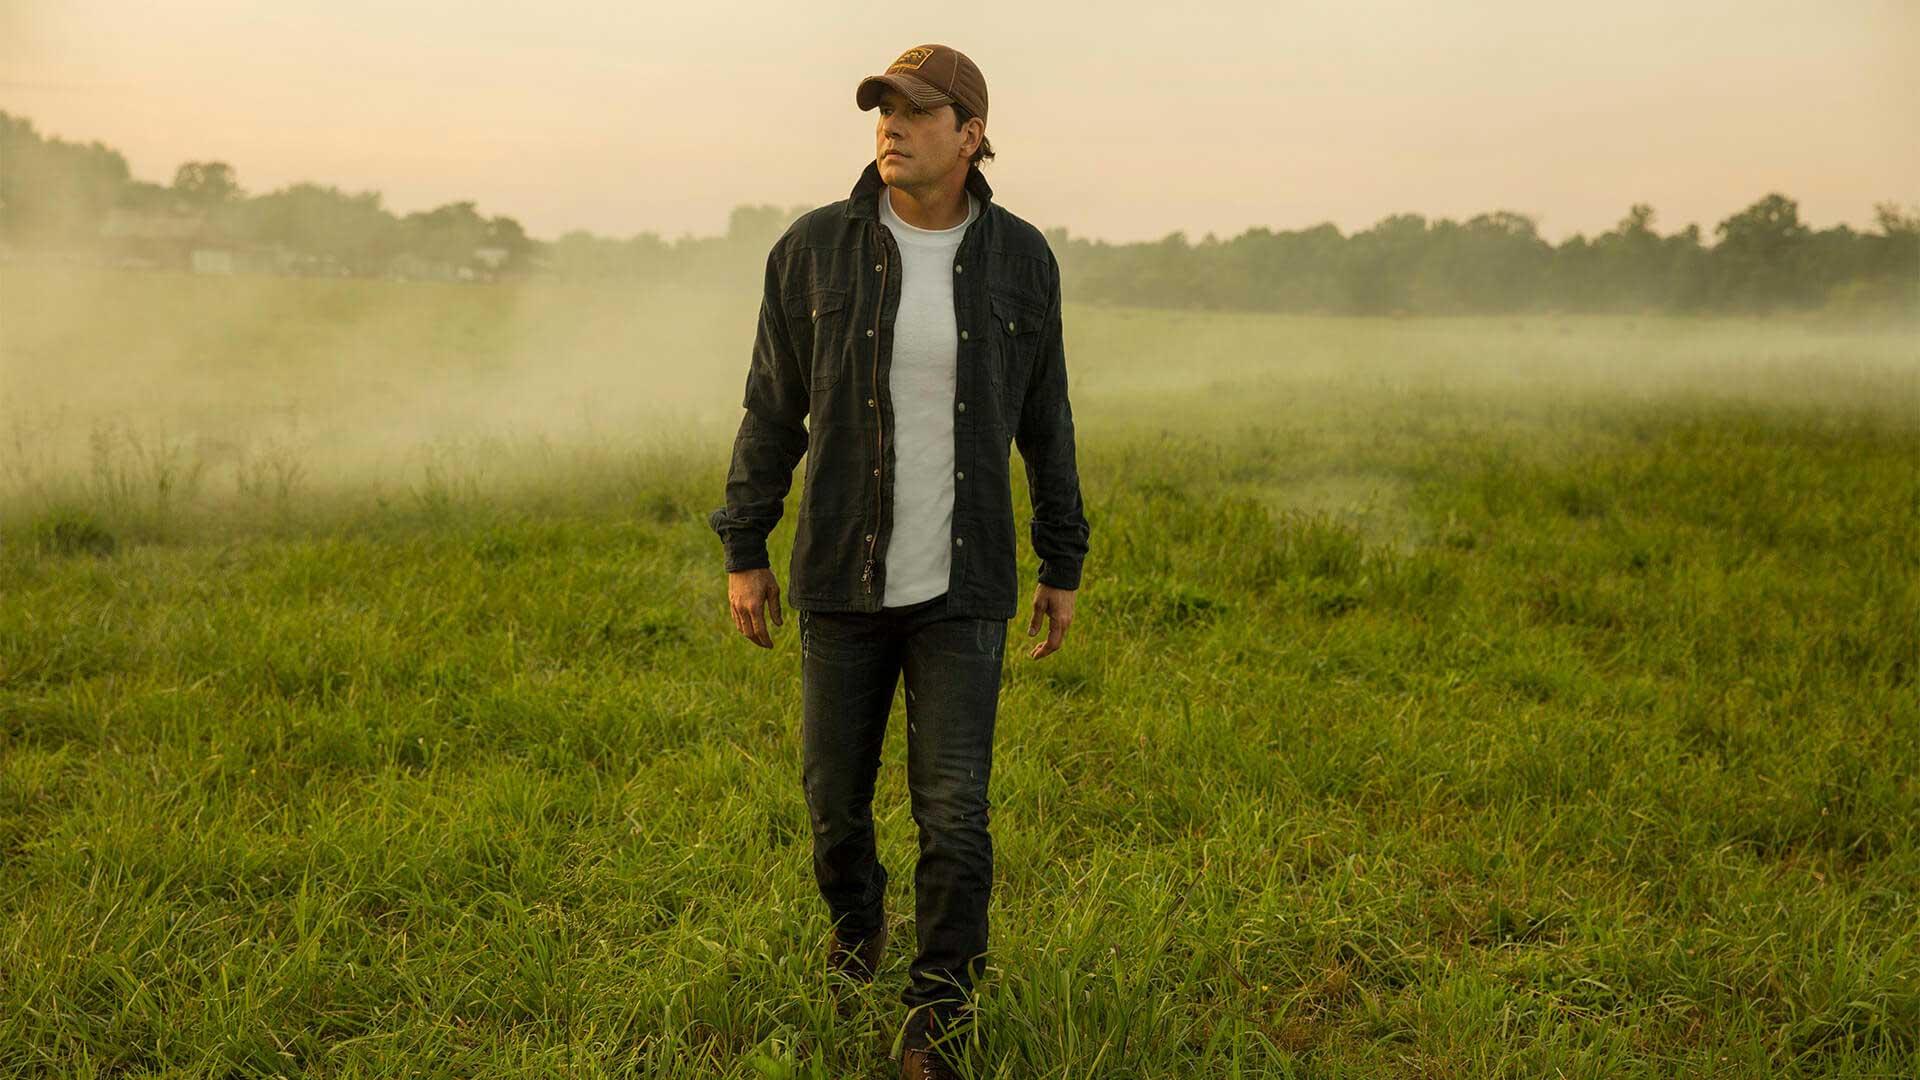 Country music star Rodney Atkins walks across a foggy field.